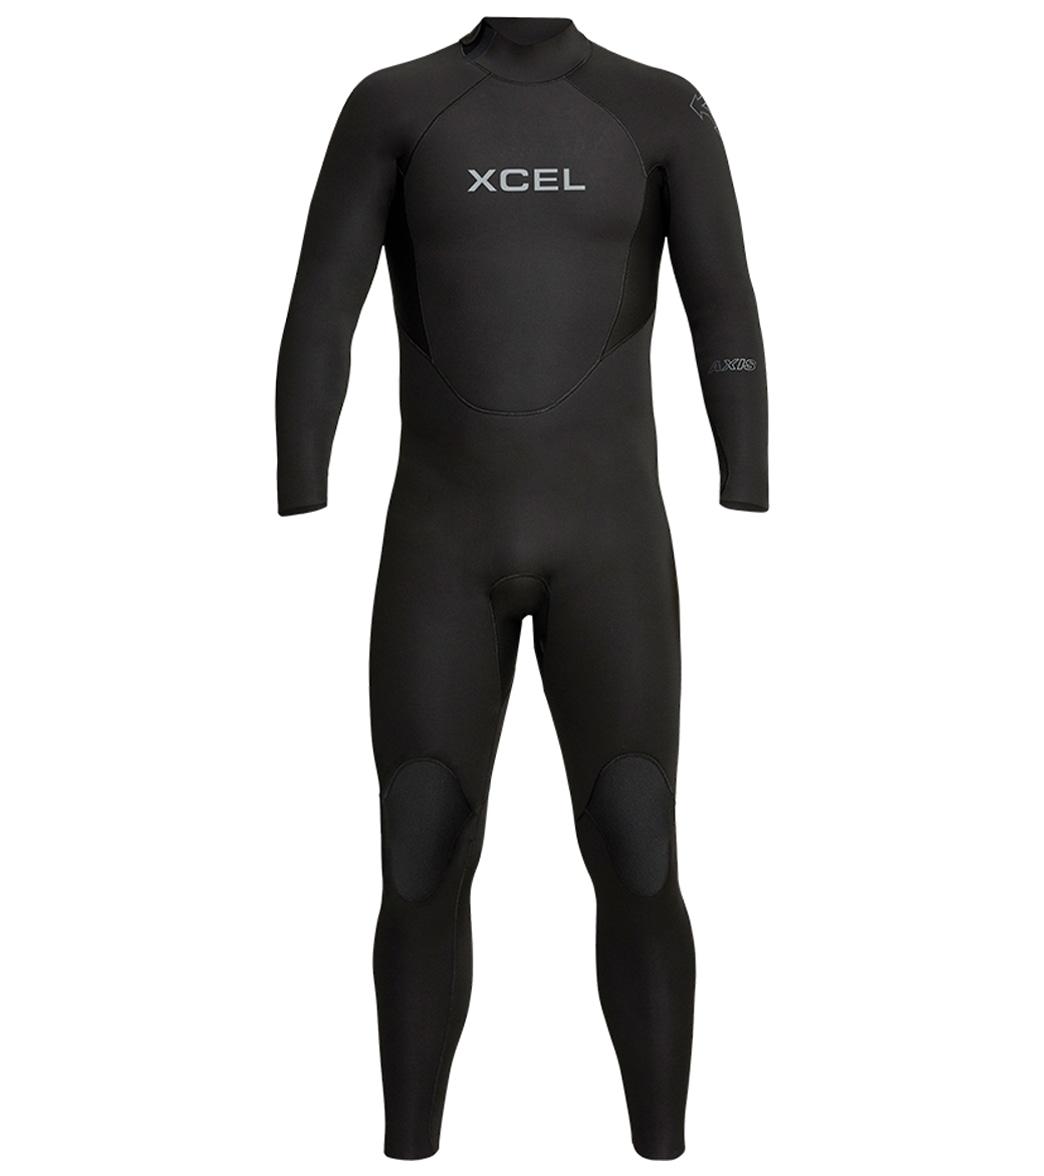 47b929be92 Xcel Men s 4 3mm Axis Back Zip Fullsuit Wetsuit at SwimOutlet.com ...